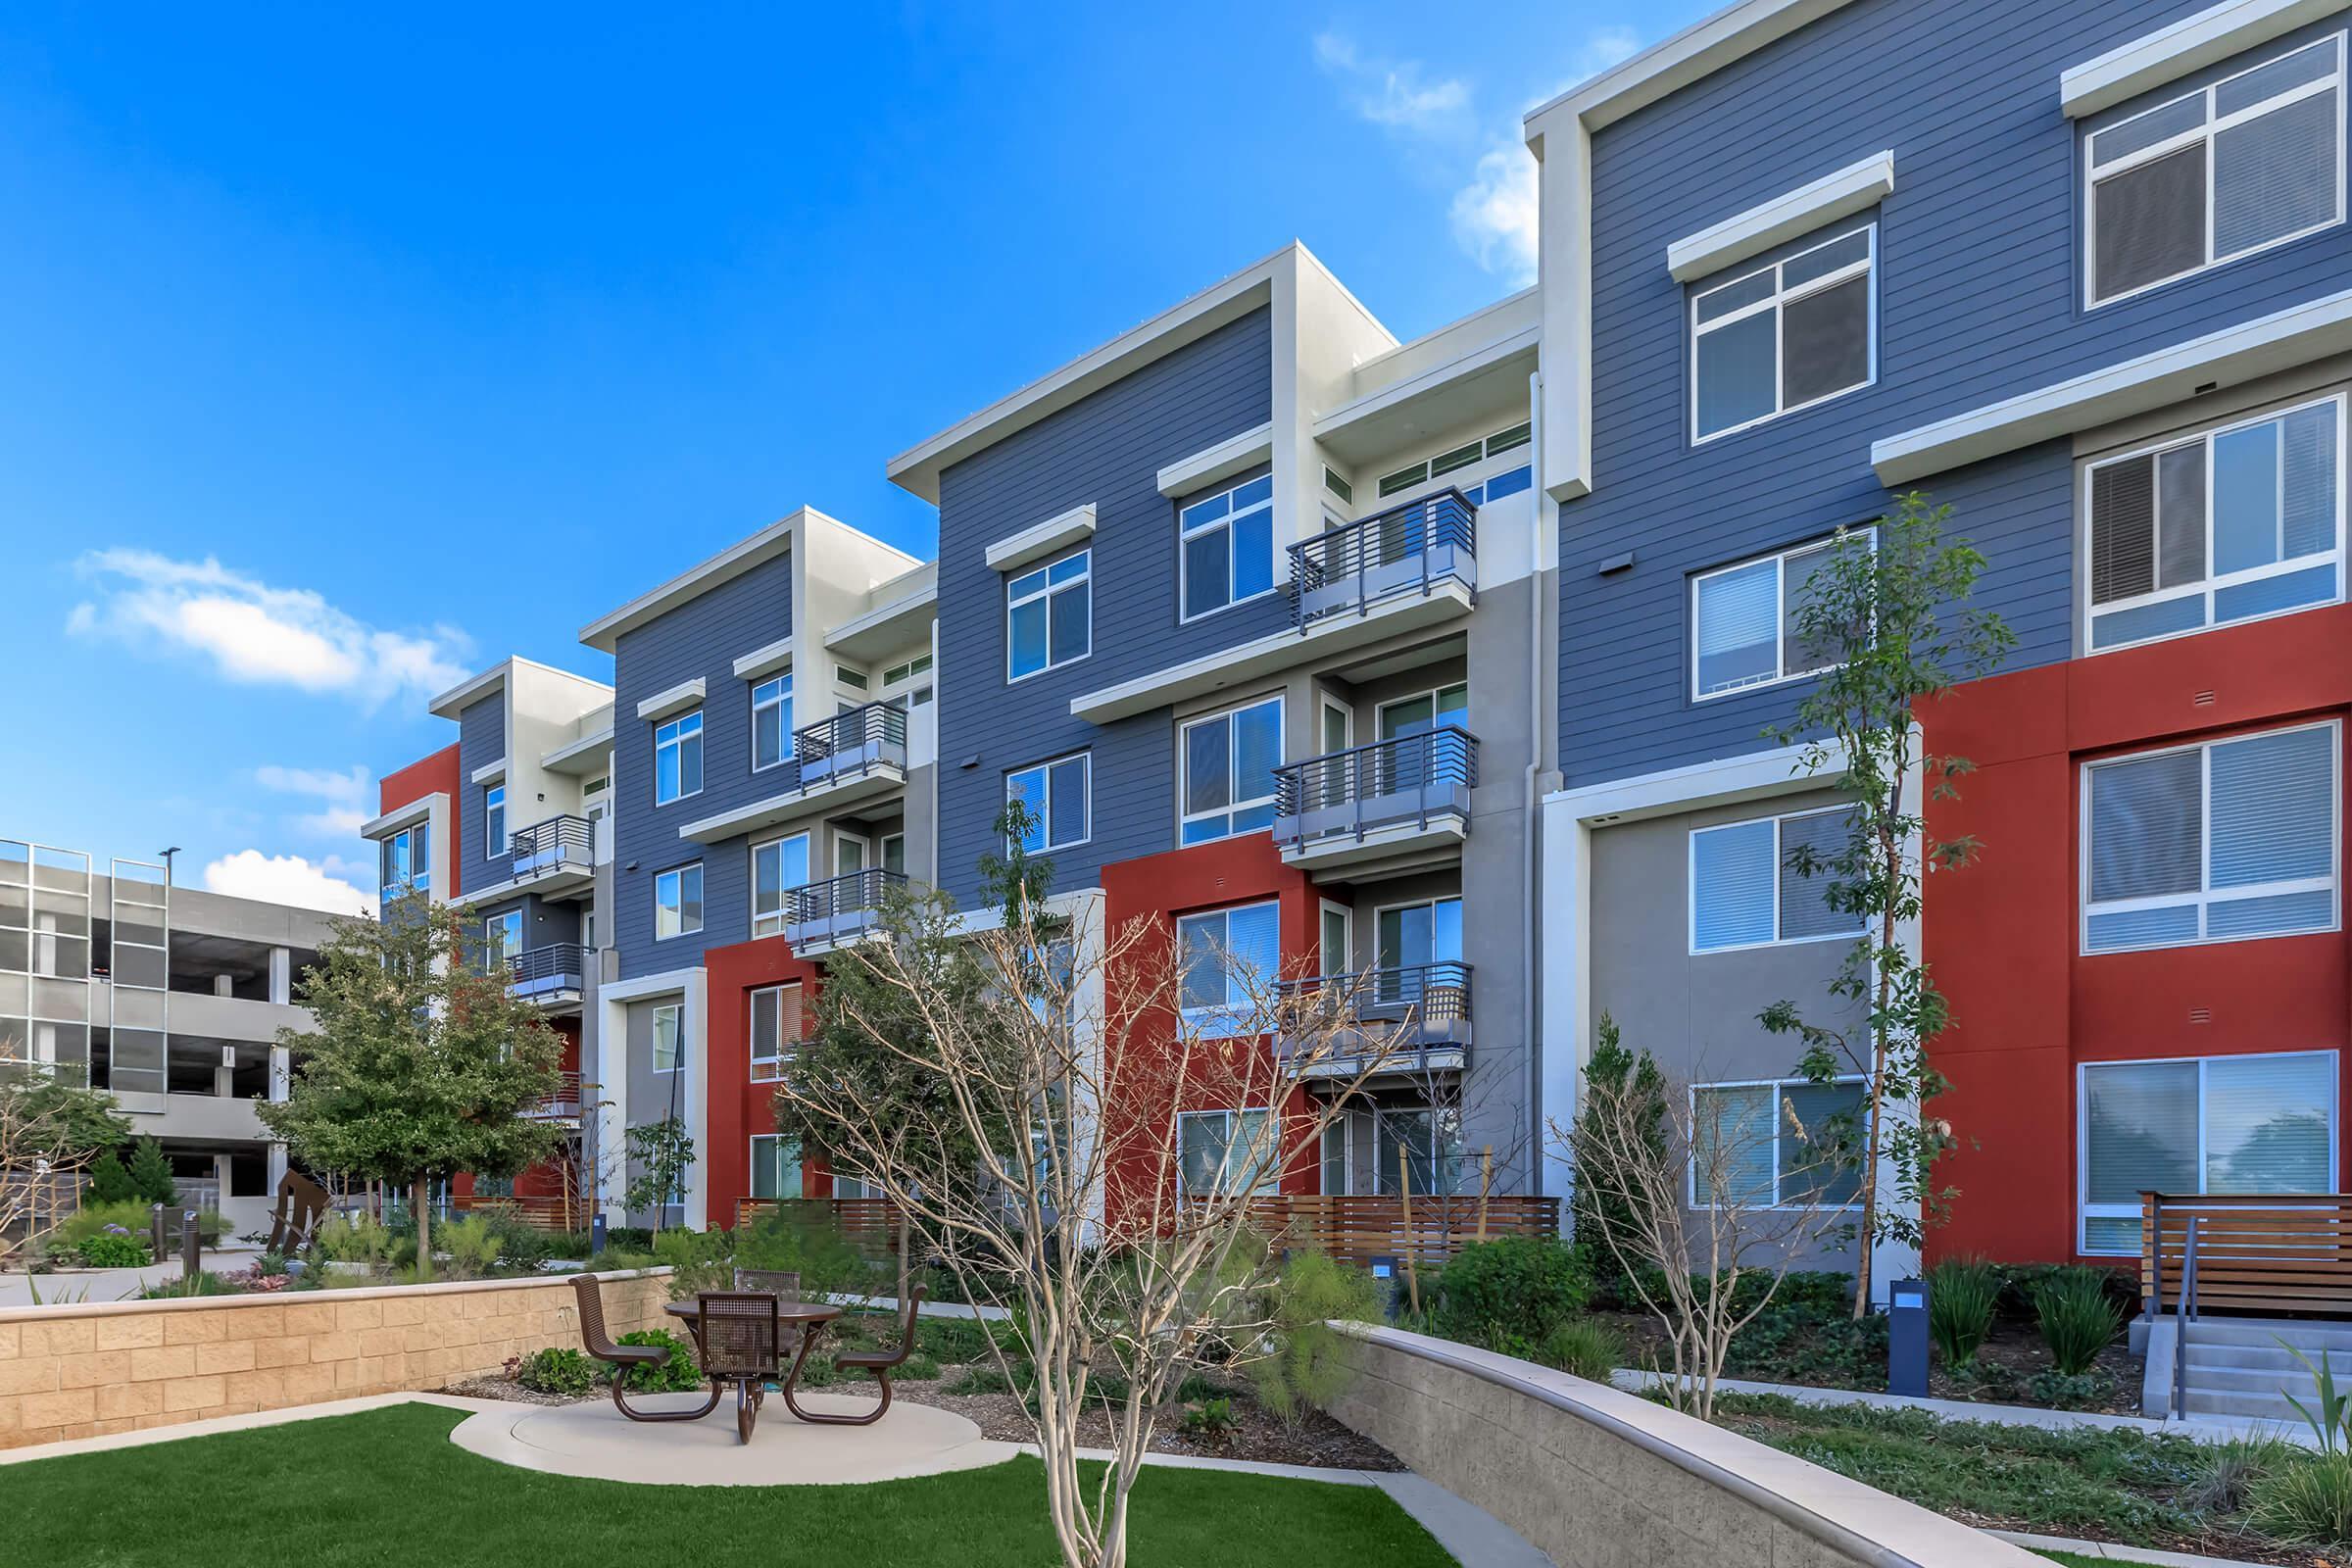 Apartments Near Biola Calligraphy Urban Residences for Biola University Students in La Mirada, CA